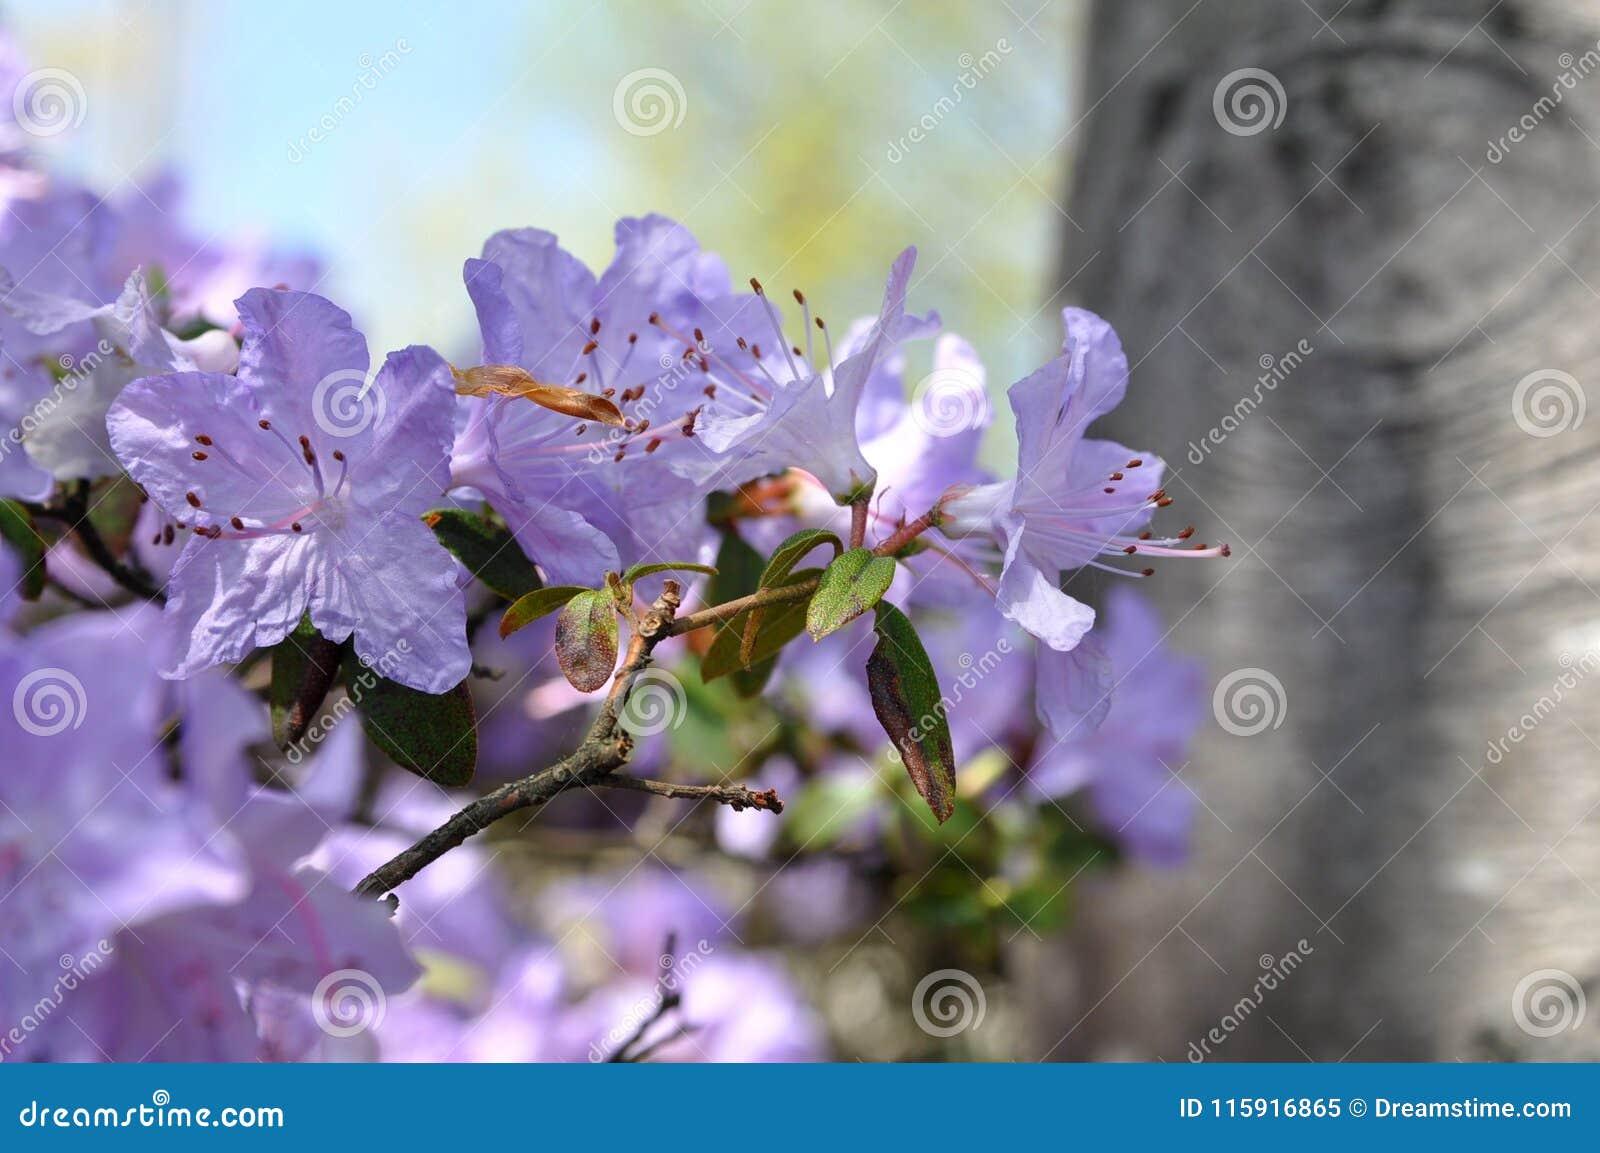 Generic Purple Flower Background Stock Image Image Of Springfield